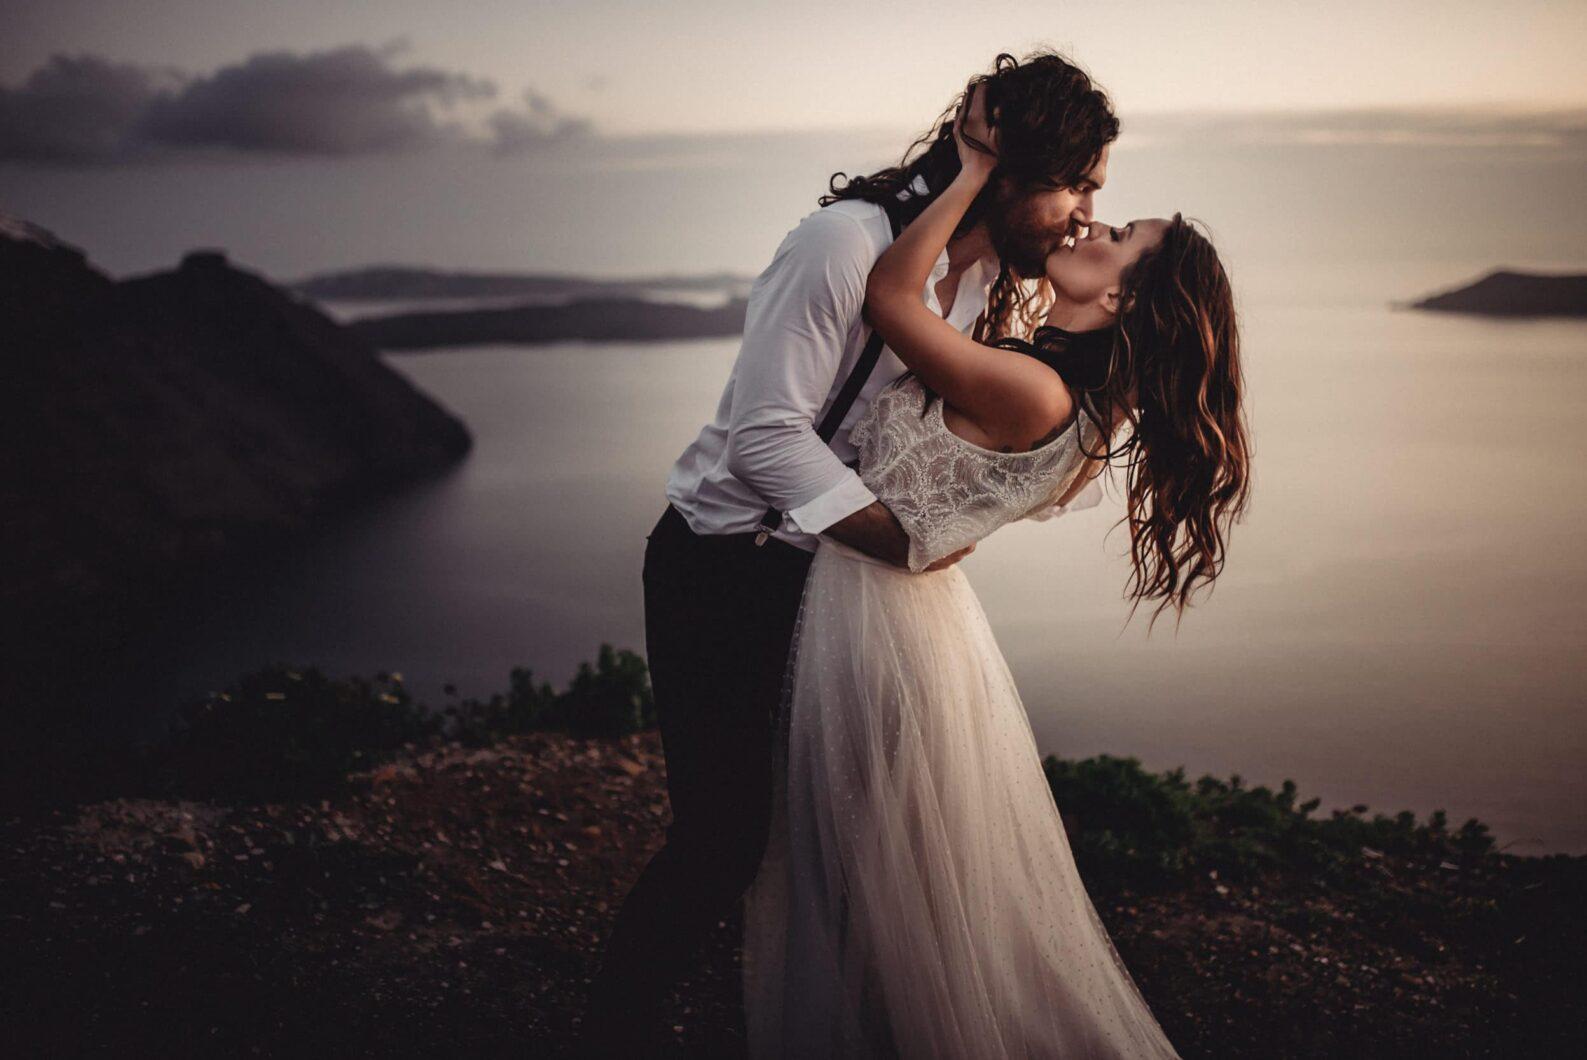 KOKO PHOTOGRAPHY - Editorial Hochzeitsfotograf00002